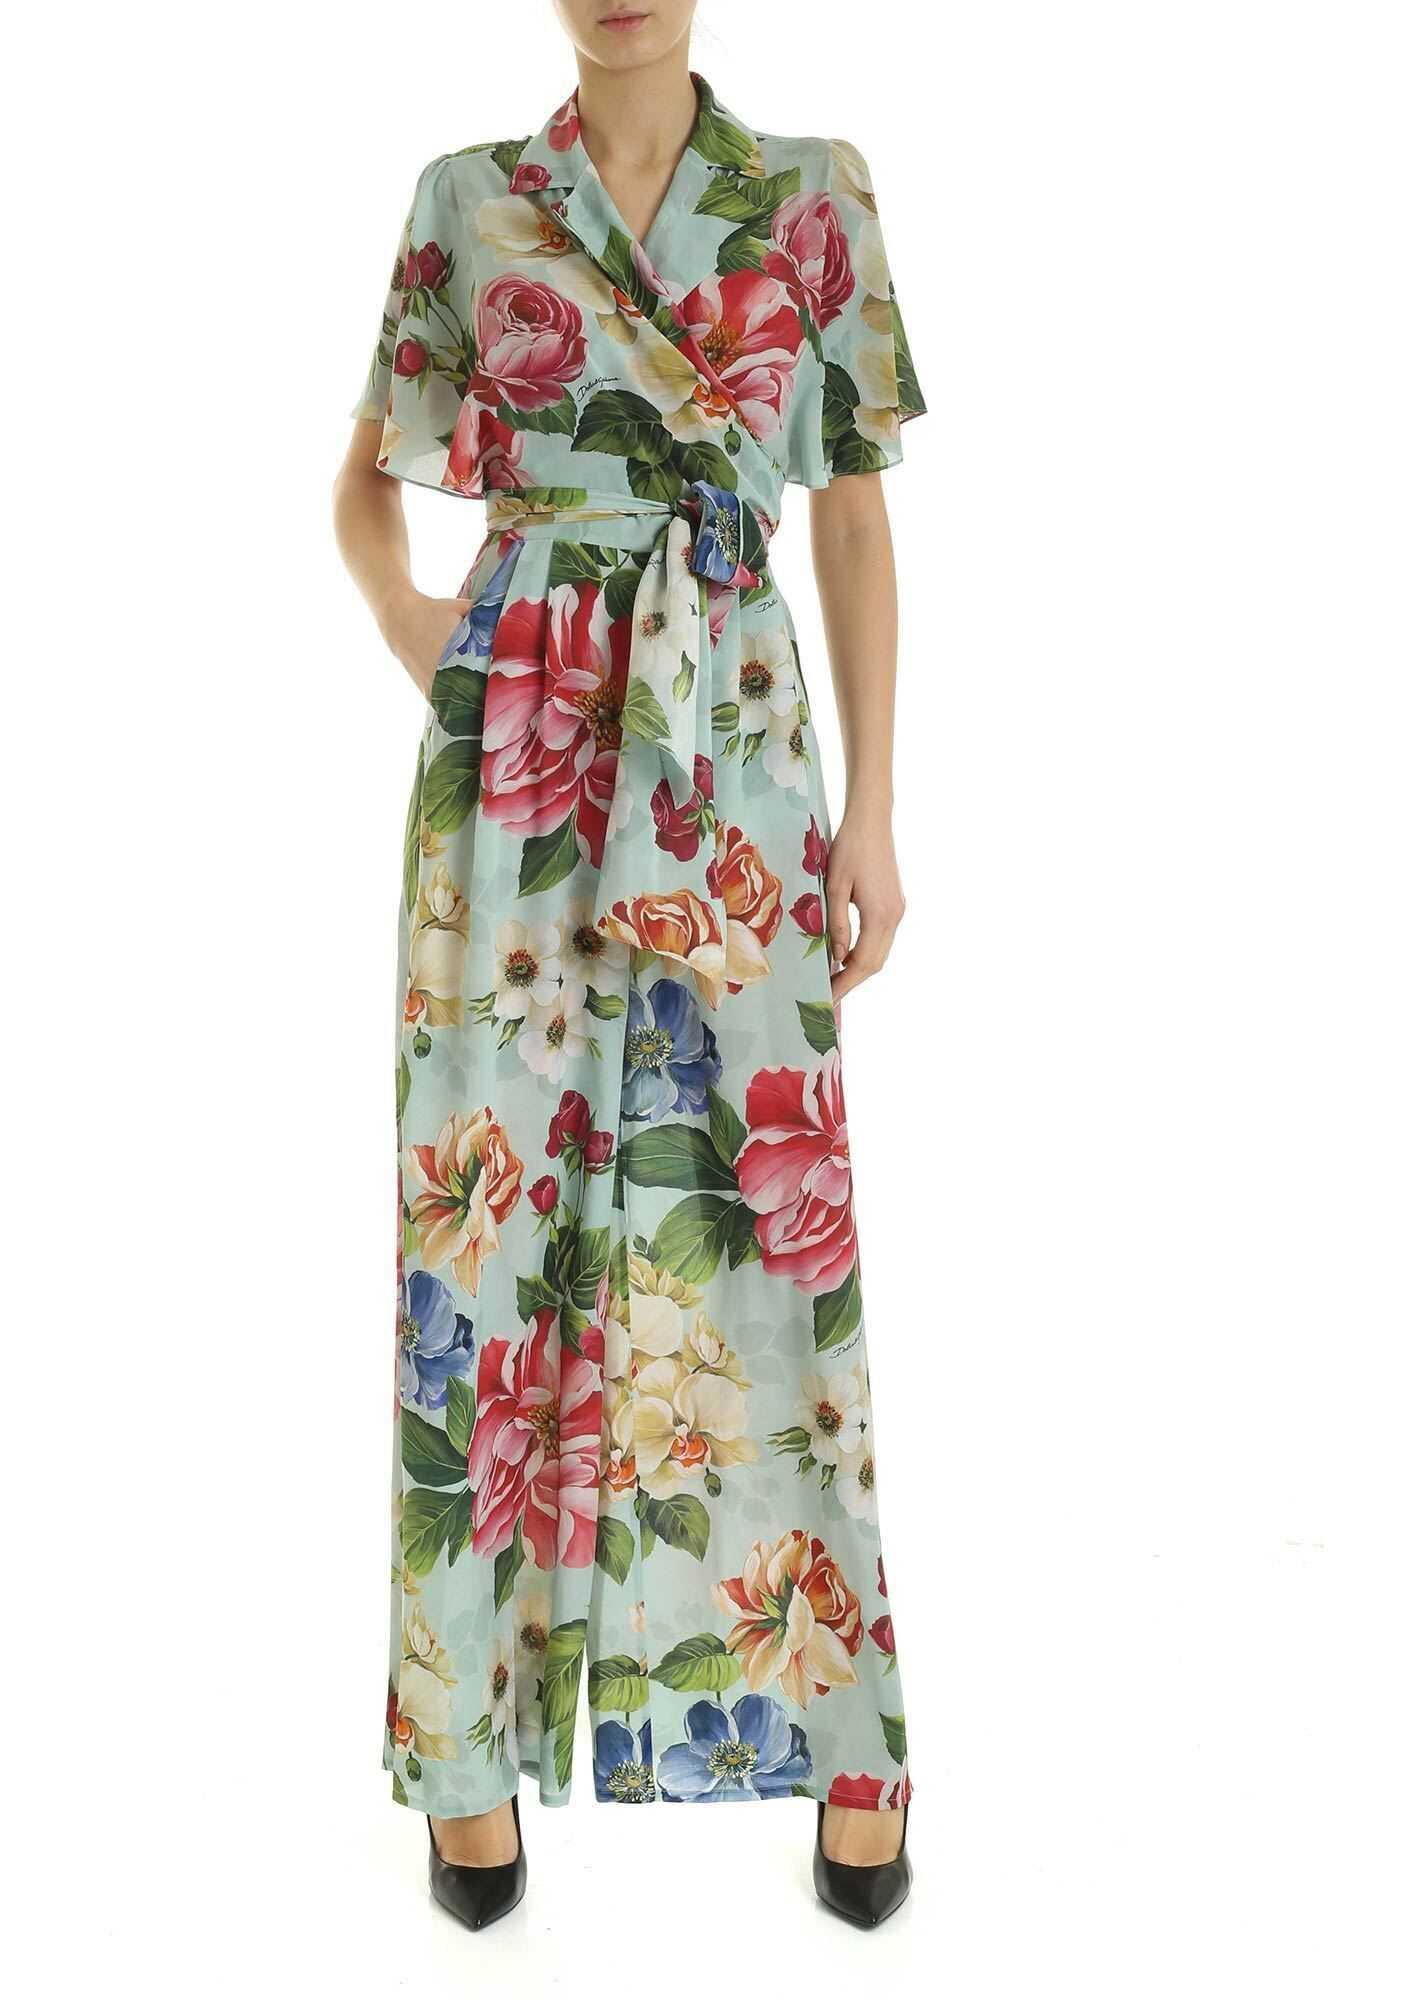 Dolce & Gabbana Flower Print Jumpsuit In Blue Multi